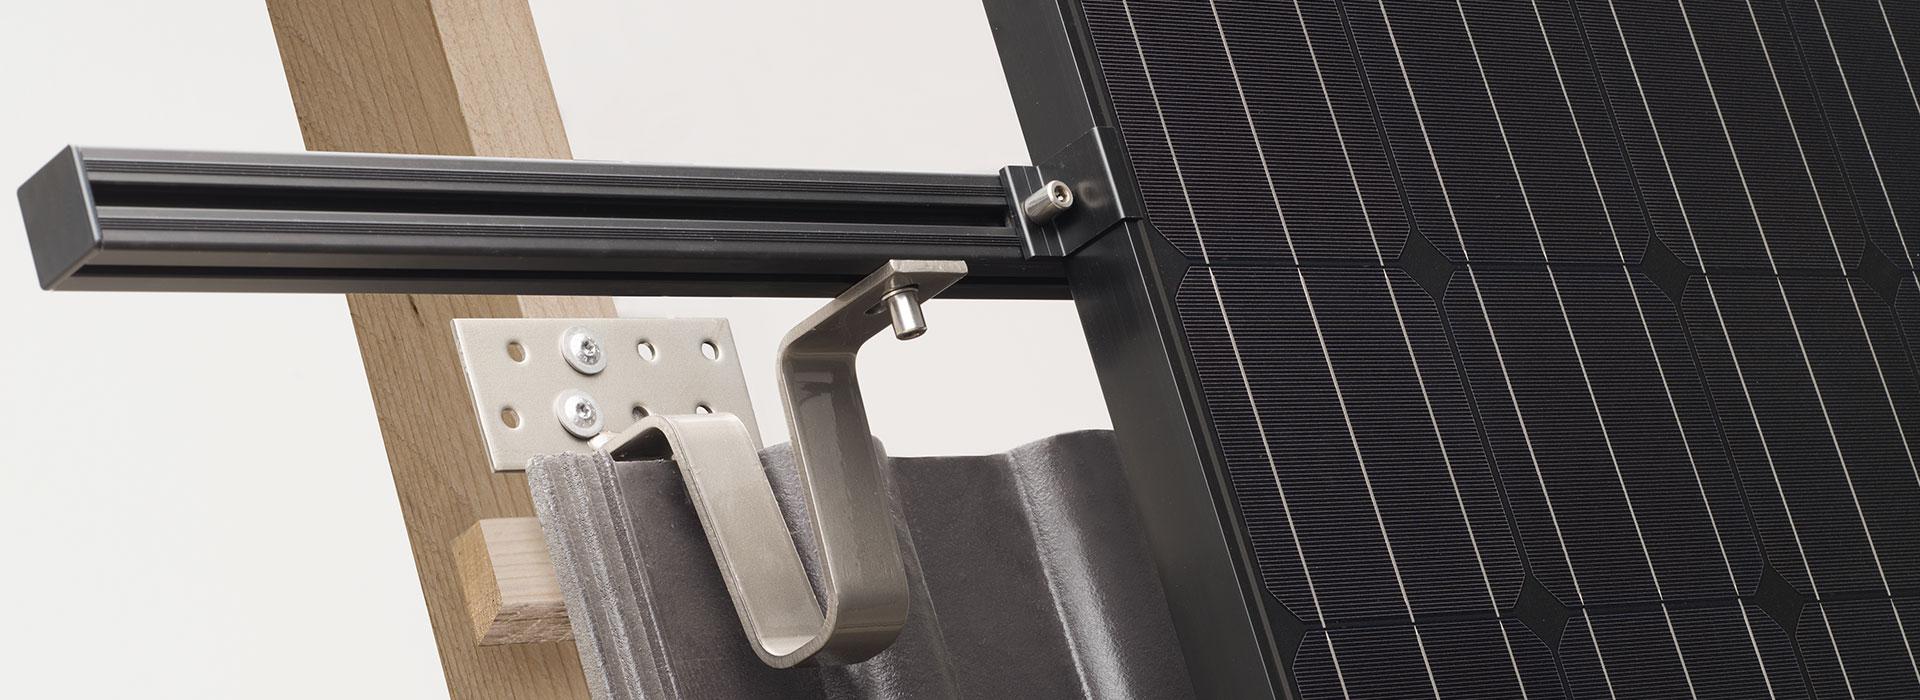 mario hanschke gmbh photovoltaik. Black Bedroom Furniture Sets. Home Design Ideas